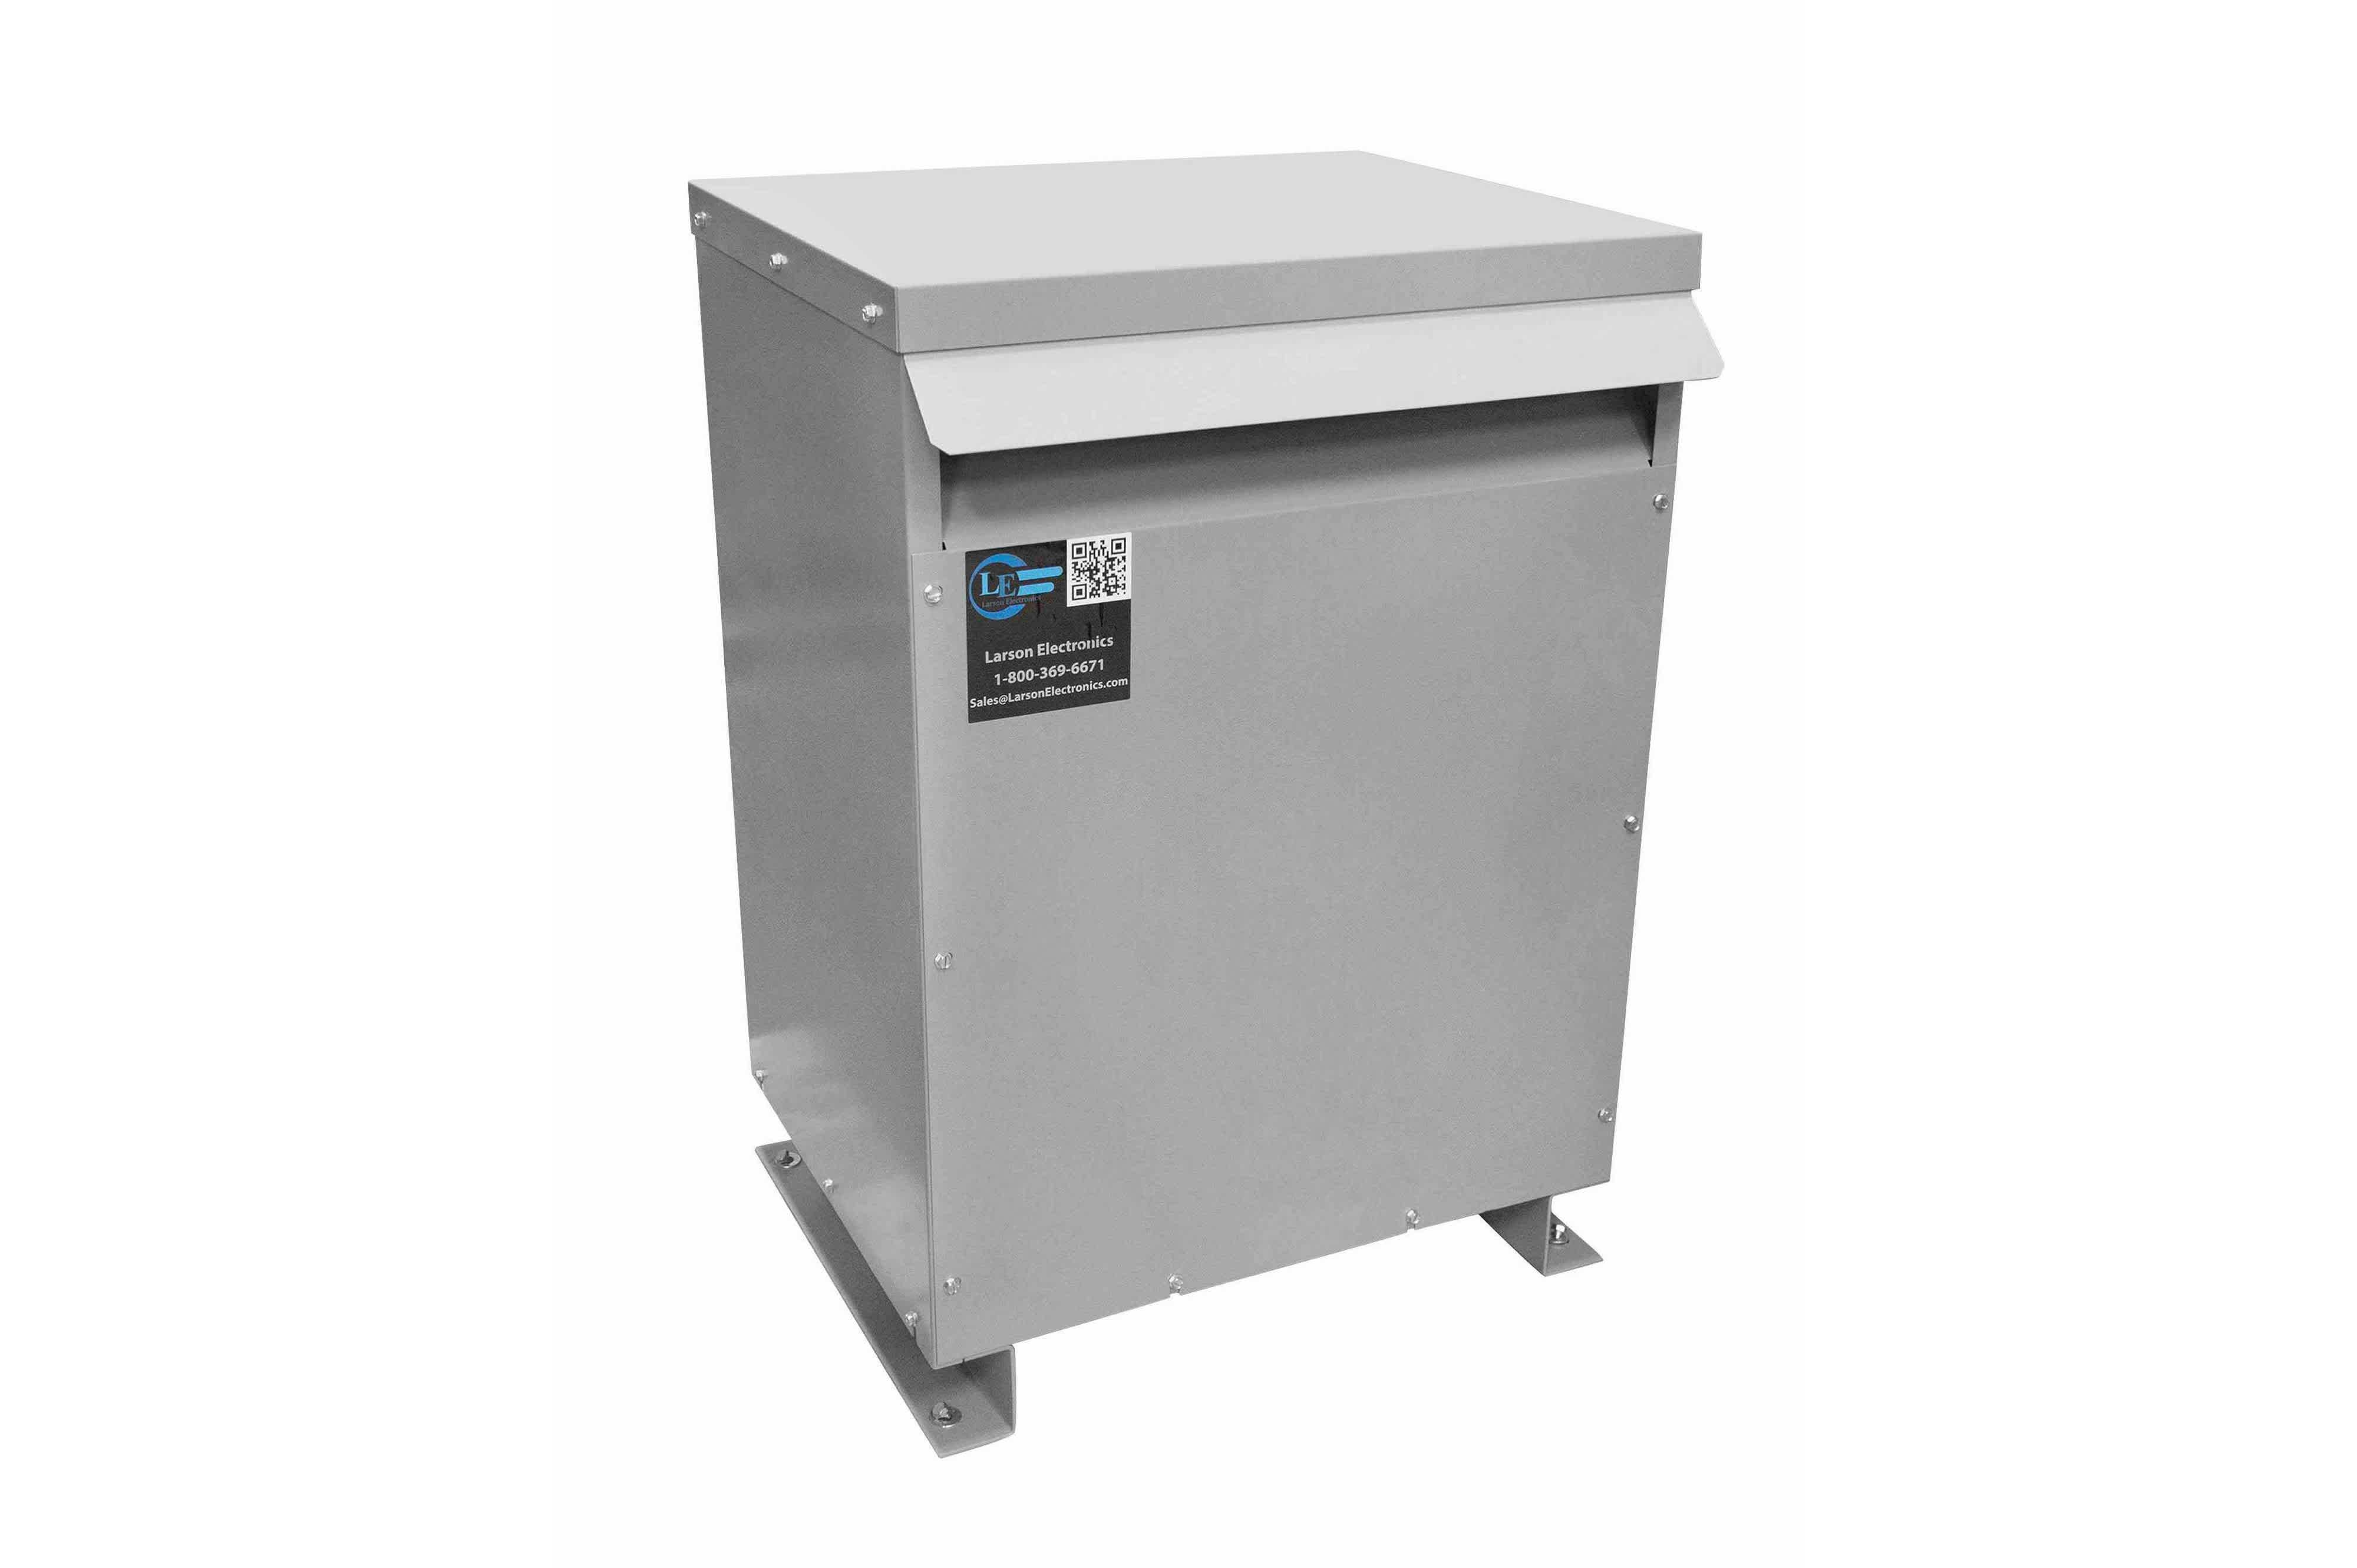 125 kVA 3PH Isolation Transformer, 380V Wye Primary, 480Y/277 Wye-N Secondary, N3R, Ventilated, 60 Hz